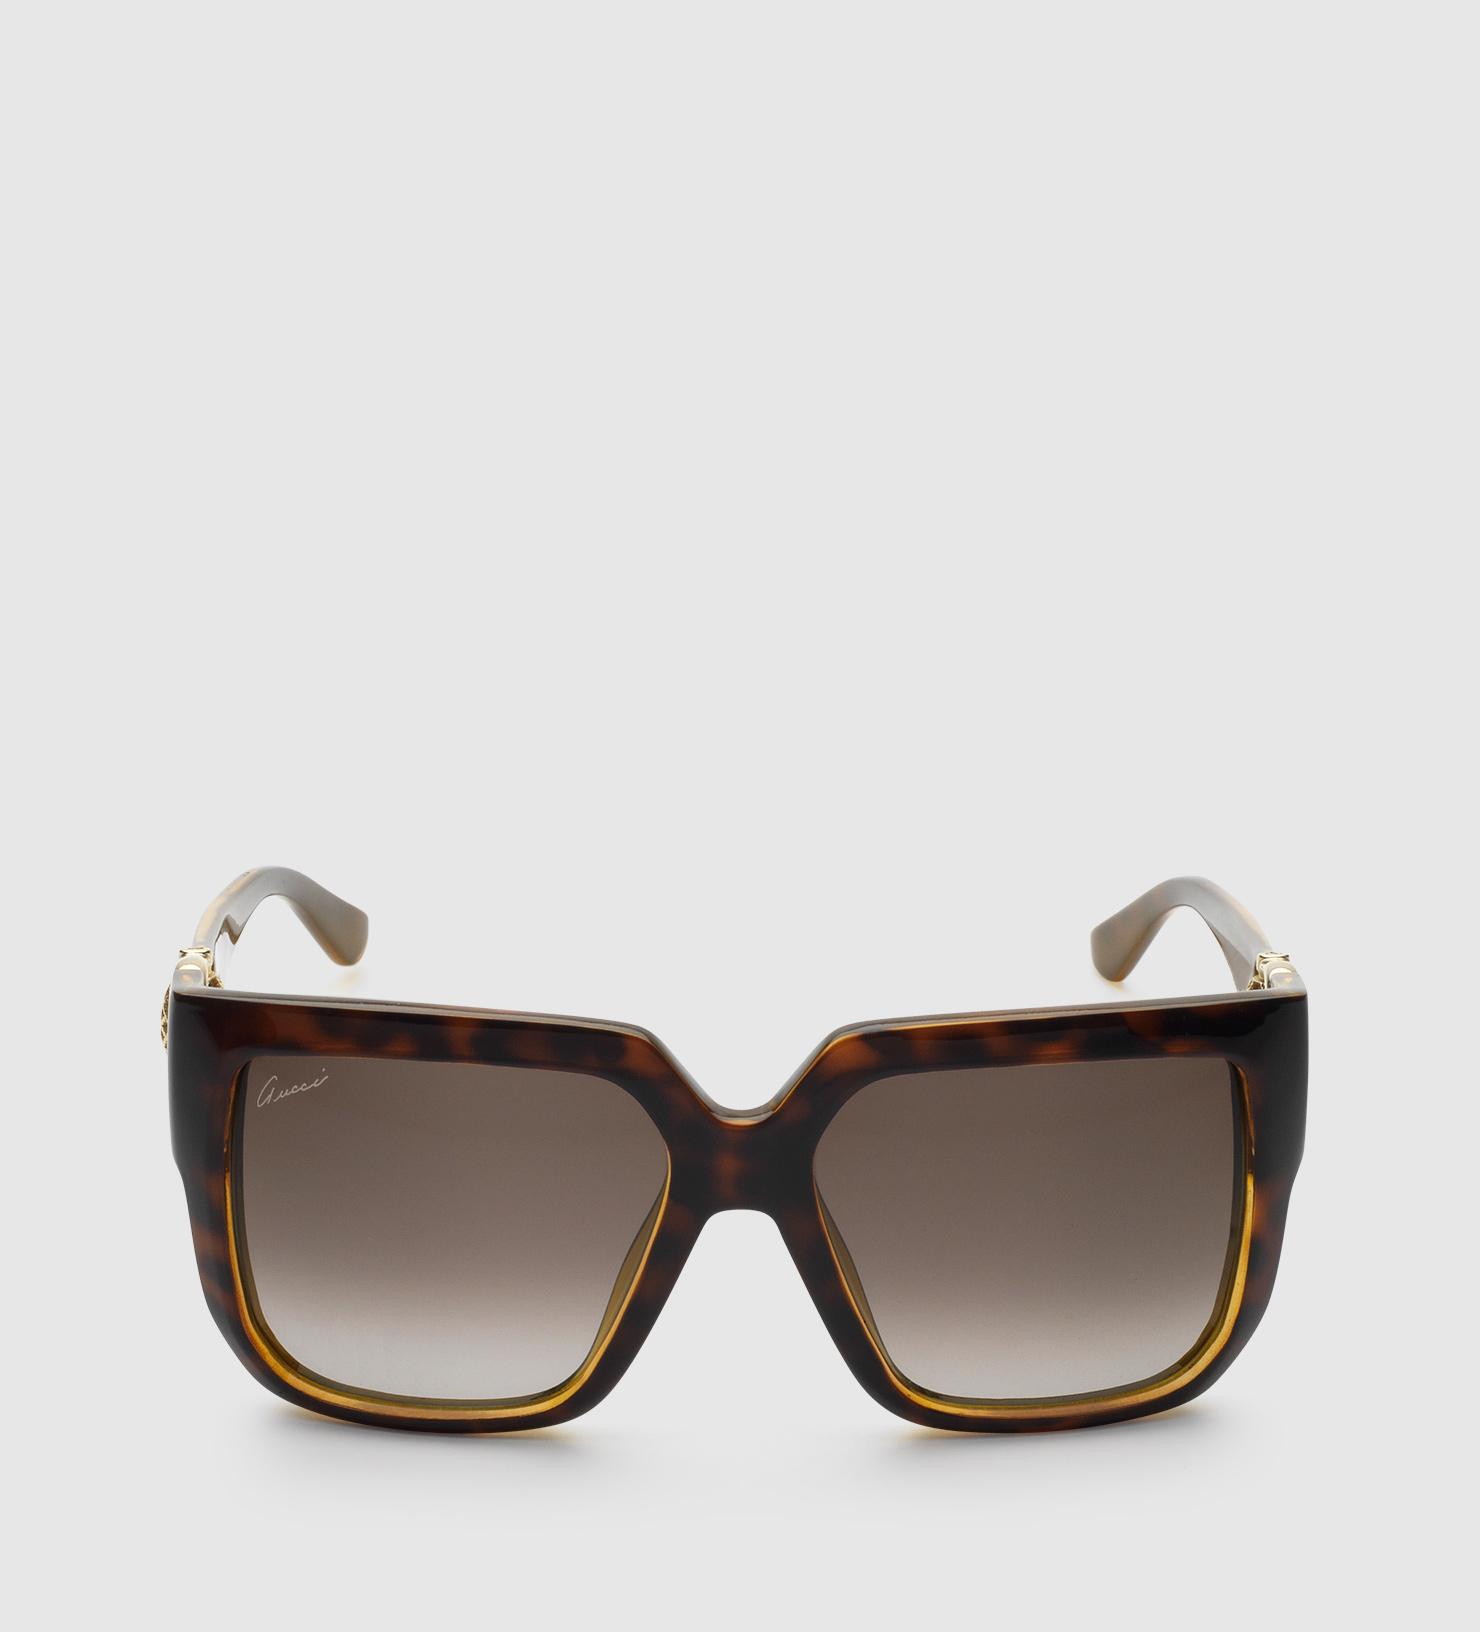 bb5ab945ff Lyst - Gucci Oversized Square-frame Horsebit Sunglasses in Black